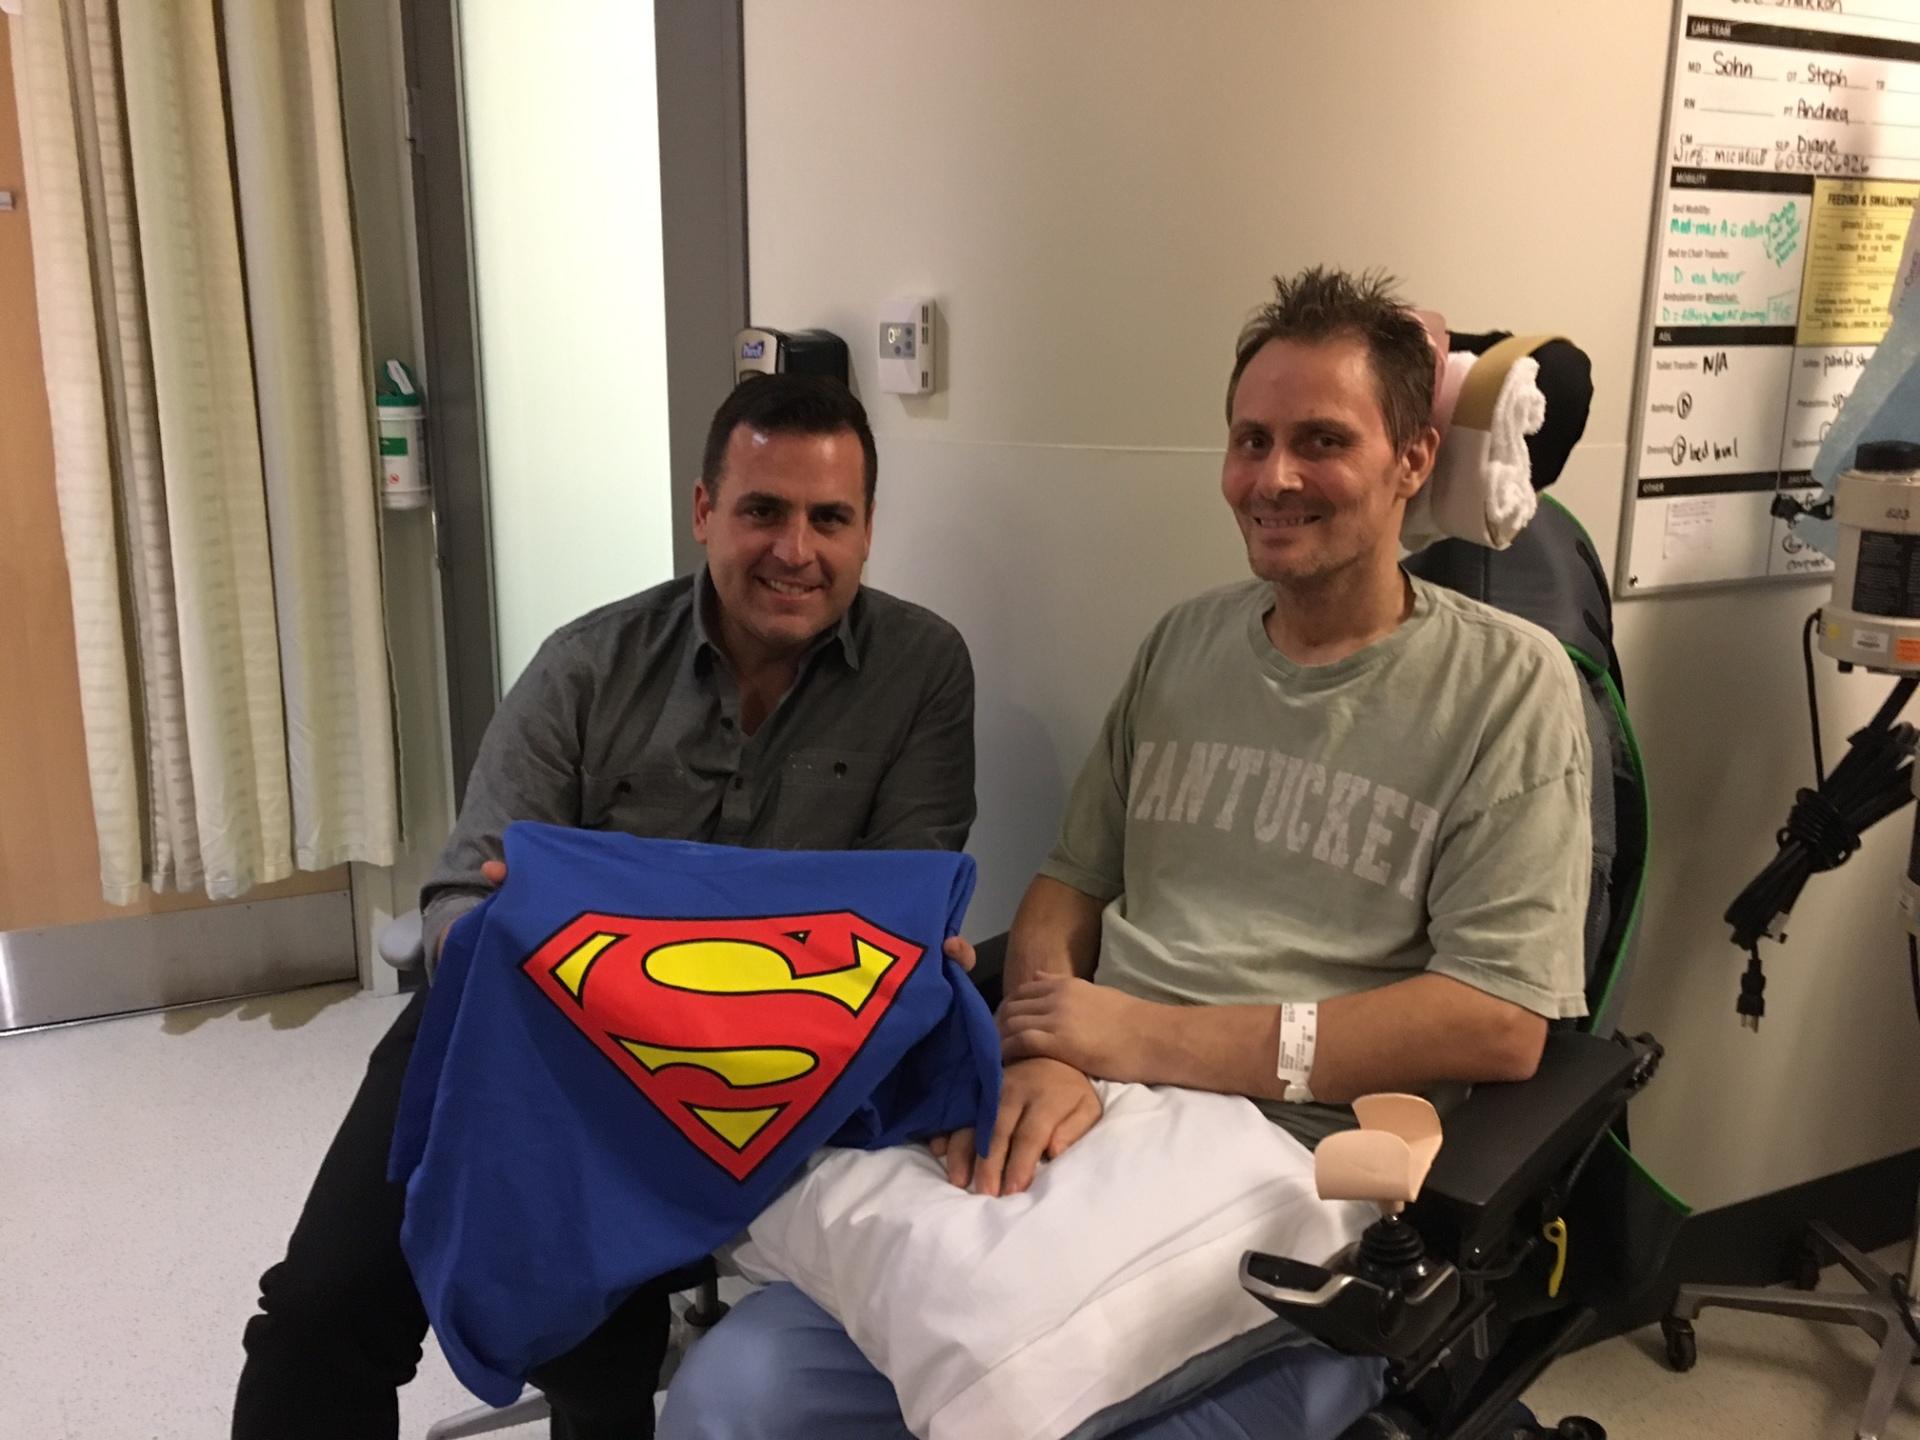 Tim and Chrisma Visit! SuperMan